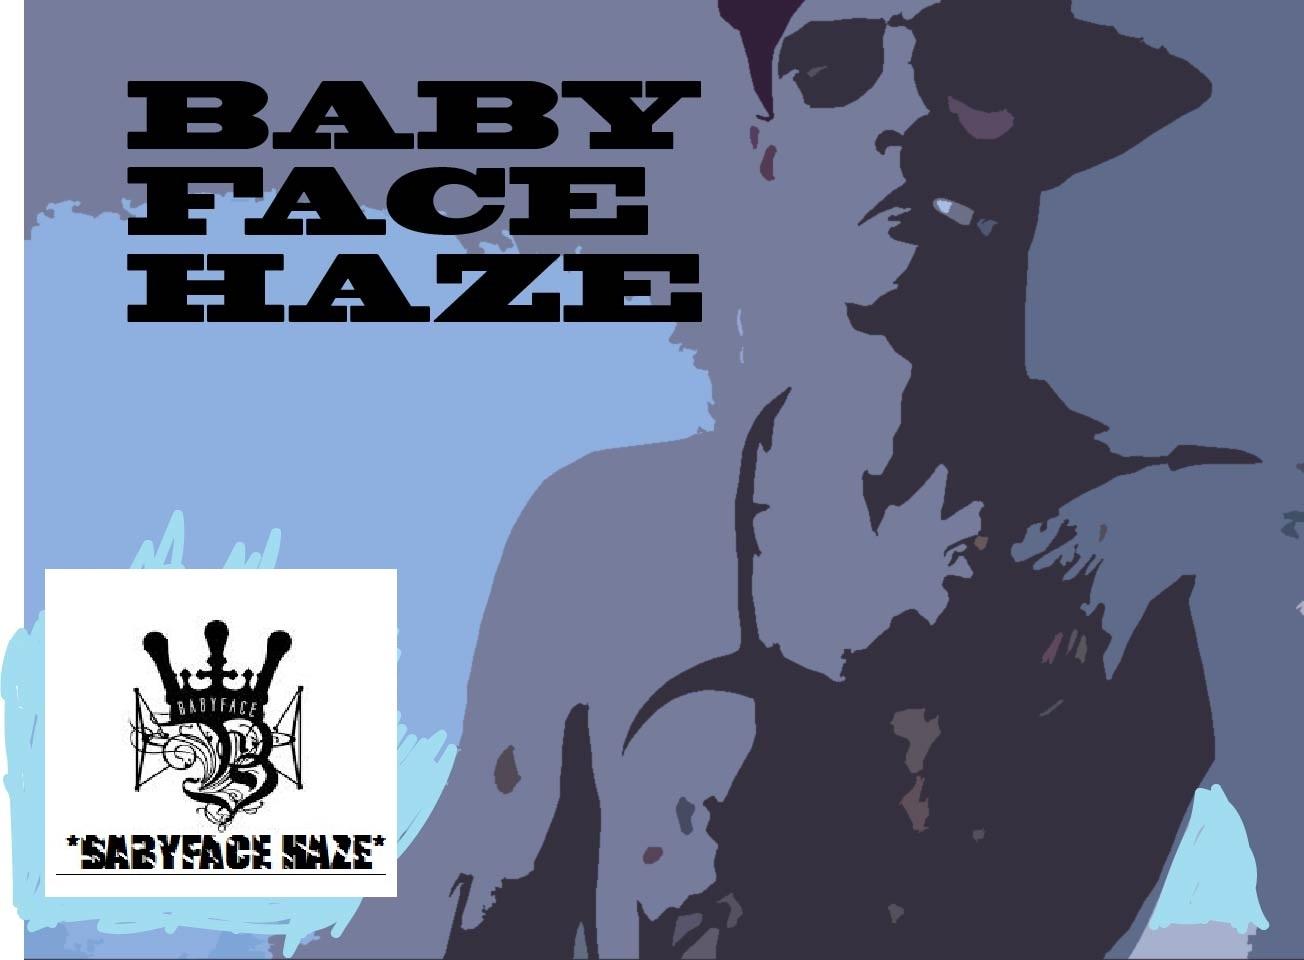 BabyfaceBDK